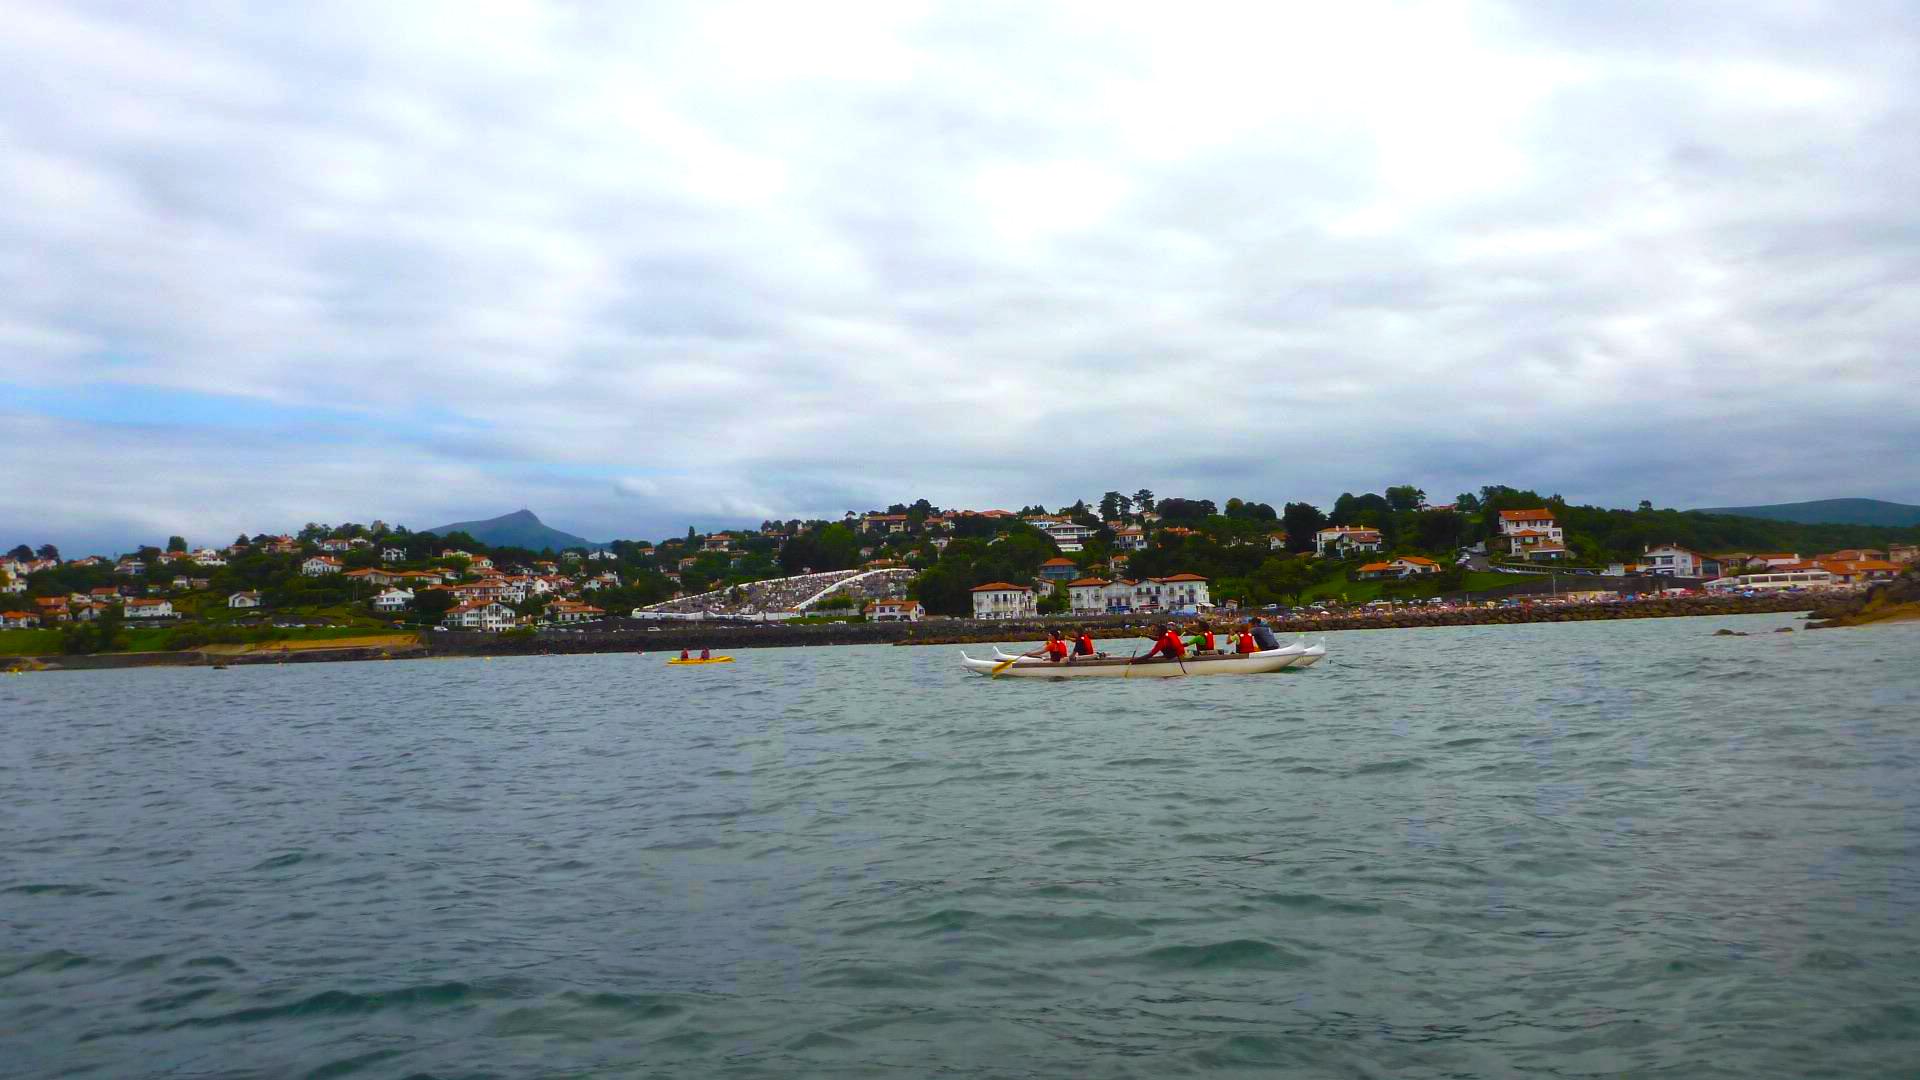 Sortie en pirogue  et kayak  dans la baie d'Hyères